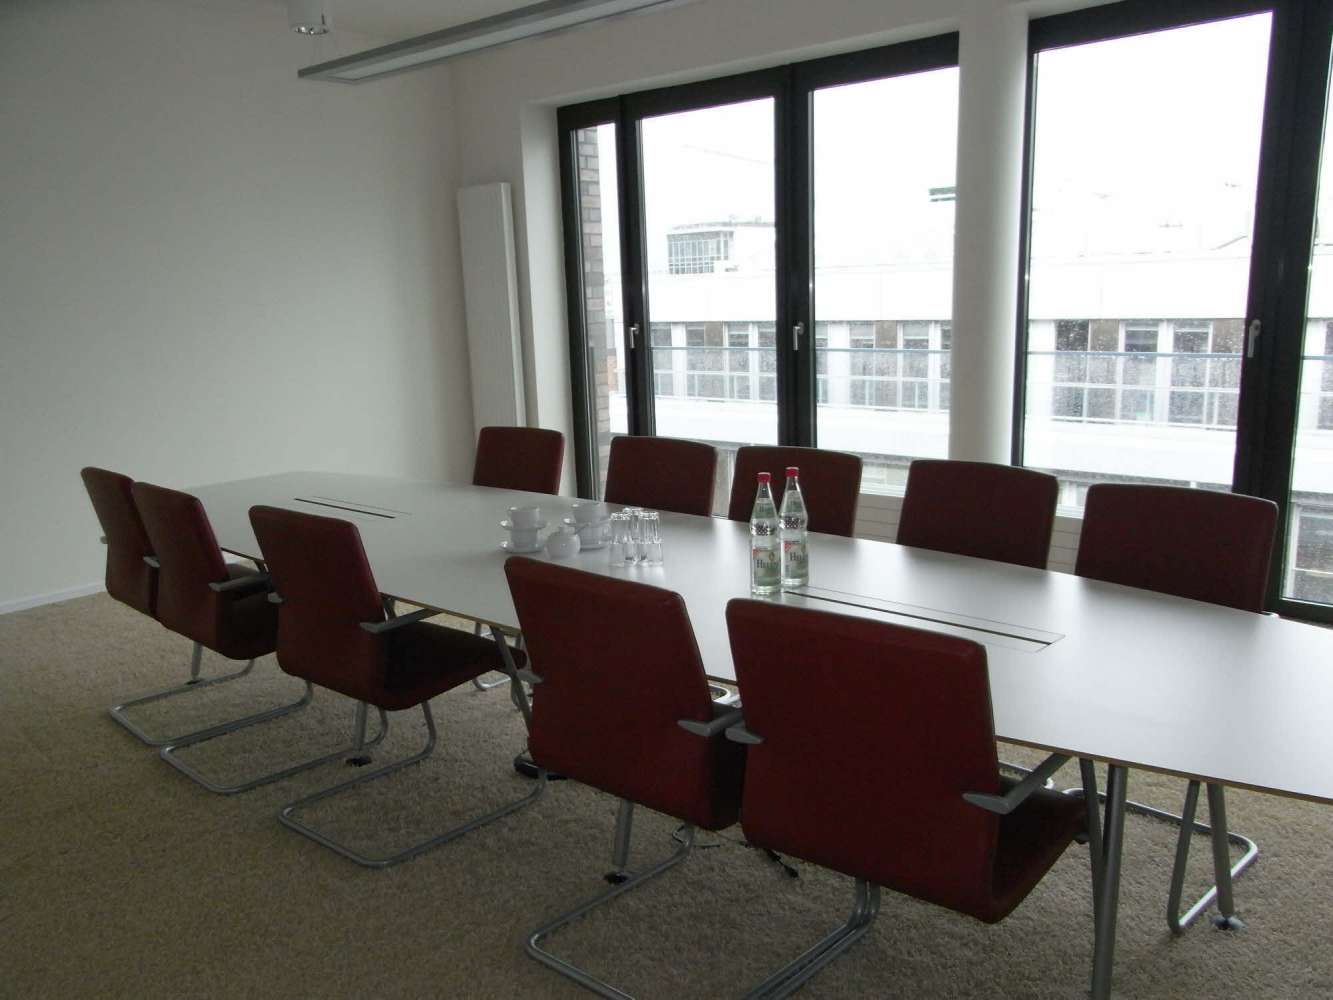 Büros Hamburg, 20097 - Büro - Hamburg, Hammerbrook - H0155 - 9504531